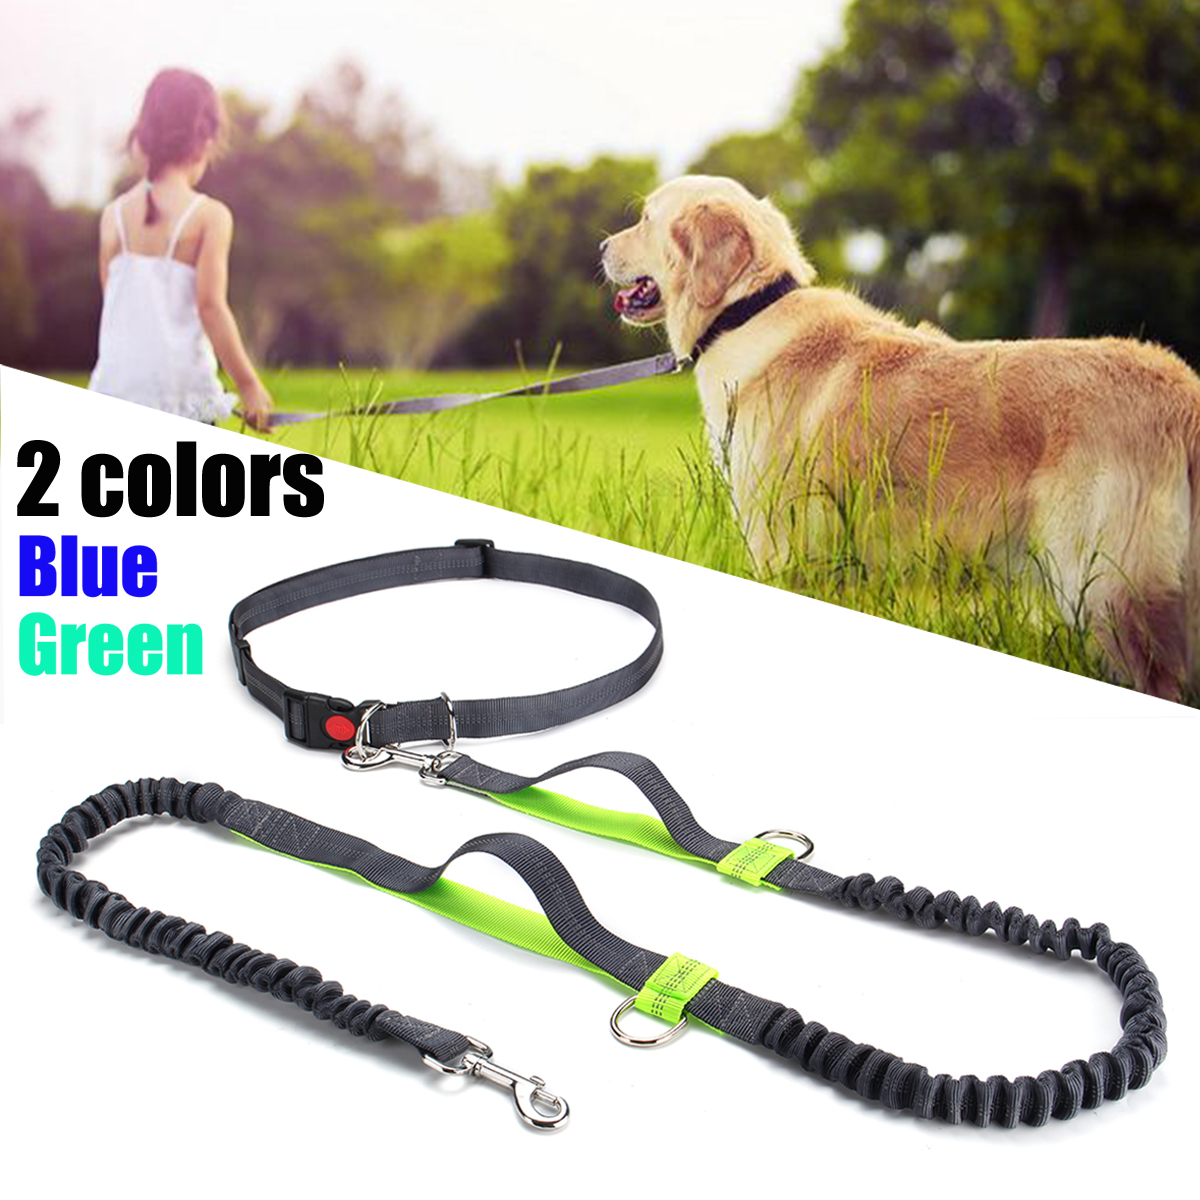 Home 1.2m Long Cute Pu Leather Pet Dog Leash Lead Walking Tracking Training Running Jogging Puppy Dog Daily Walking Lead Collar